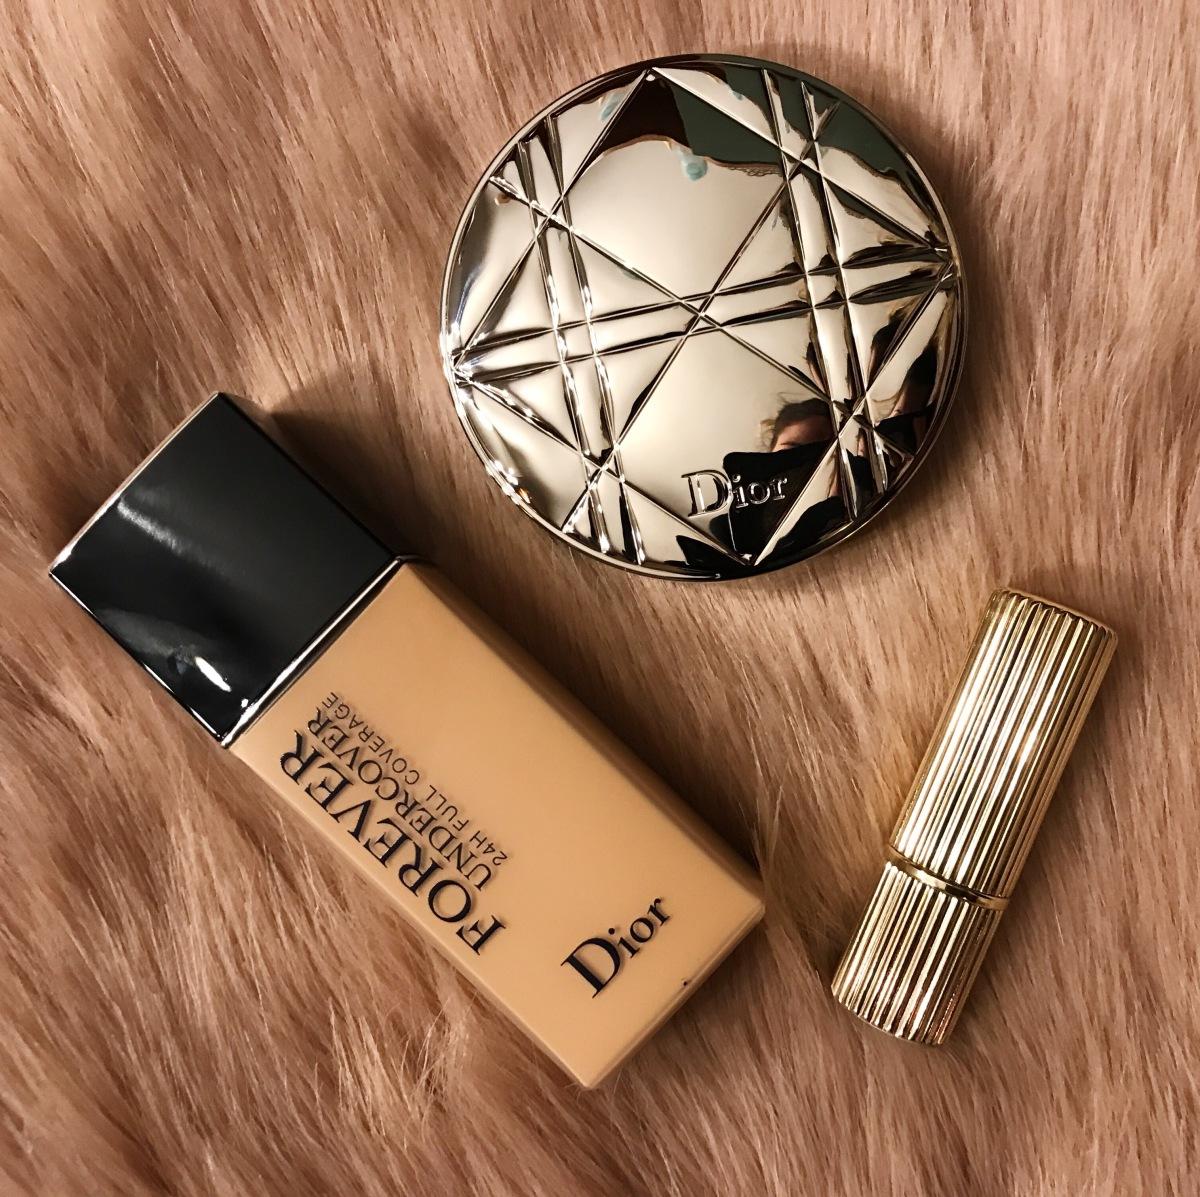 Recenzija: Dior Forever Undercover puder, Diorskin Nude Air Luminizer highligther & Victoria Beckham x Estée Lauder Black Cassis ruž zausne